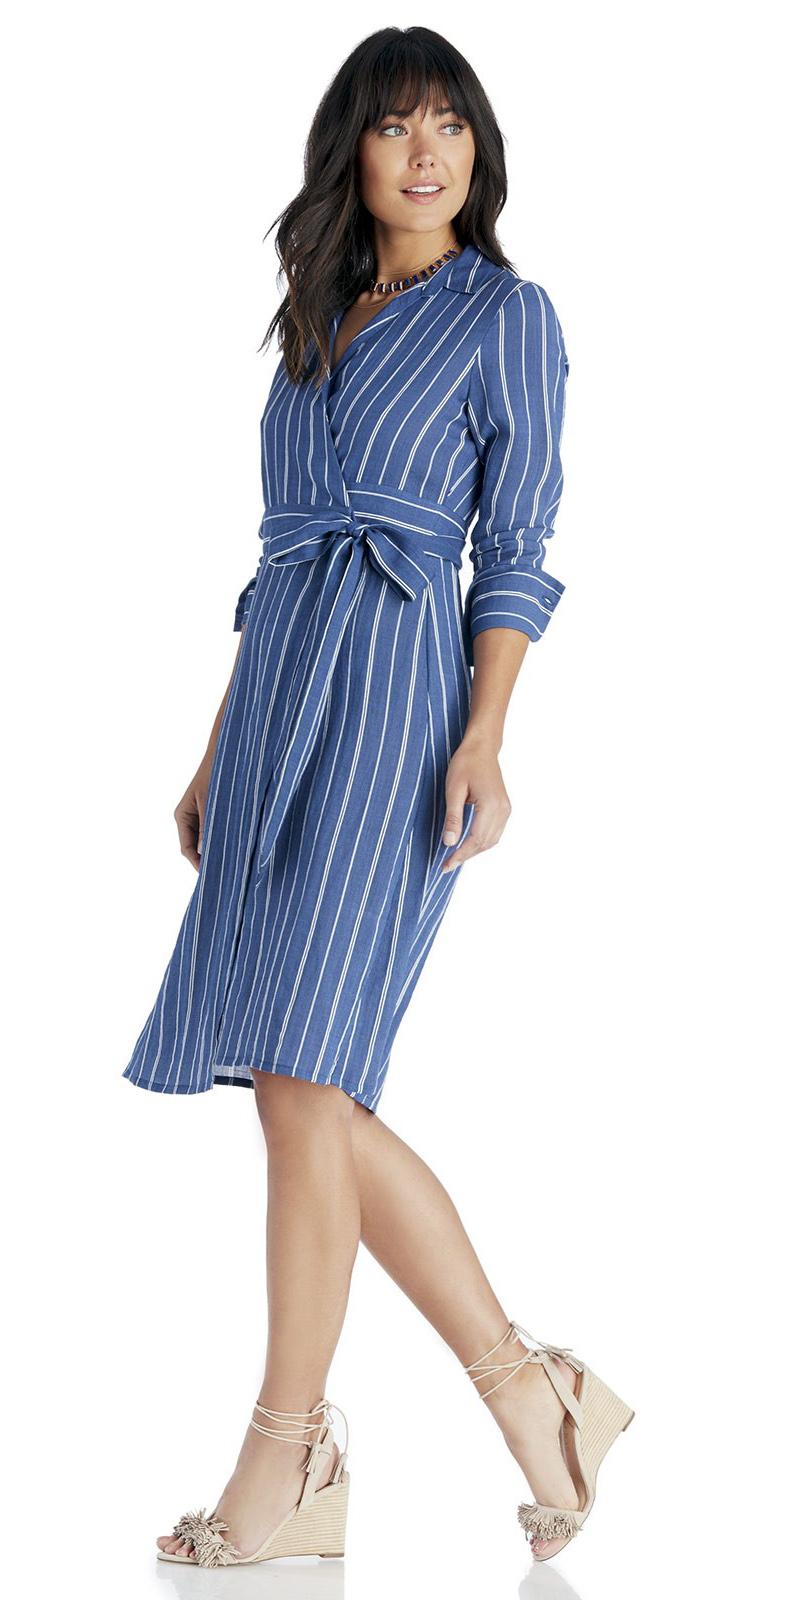 blue-med-dress-shirt-wrap-vertical-stripe-necklace-tan-shoe-sandalw-hairr-spring-summer-work.jpg